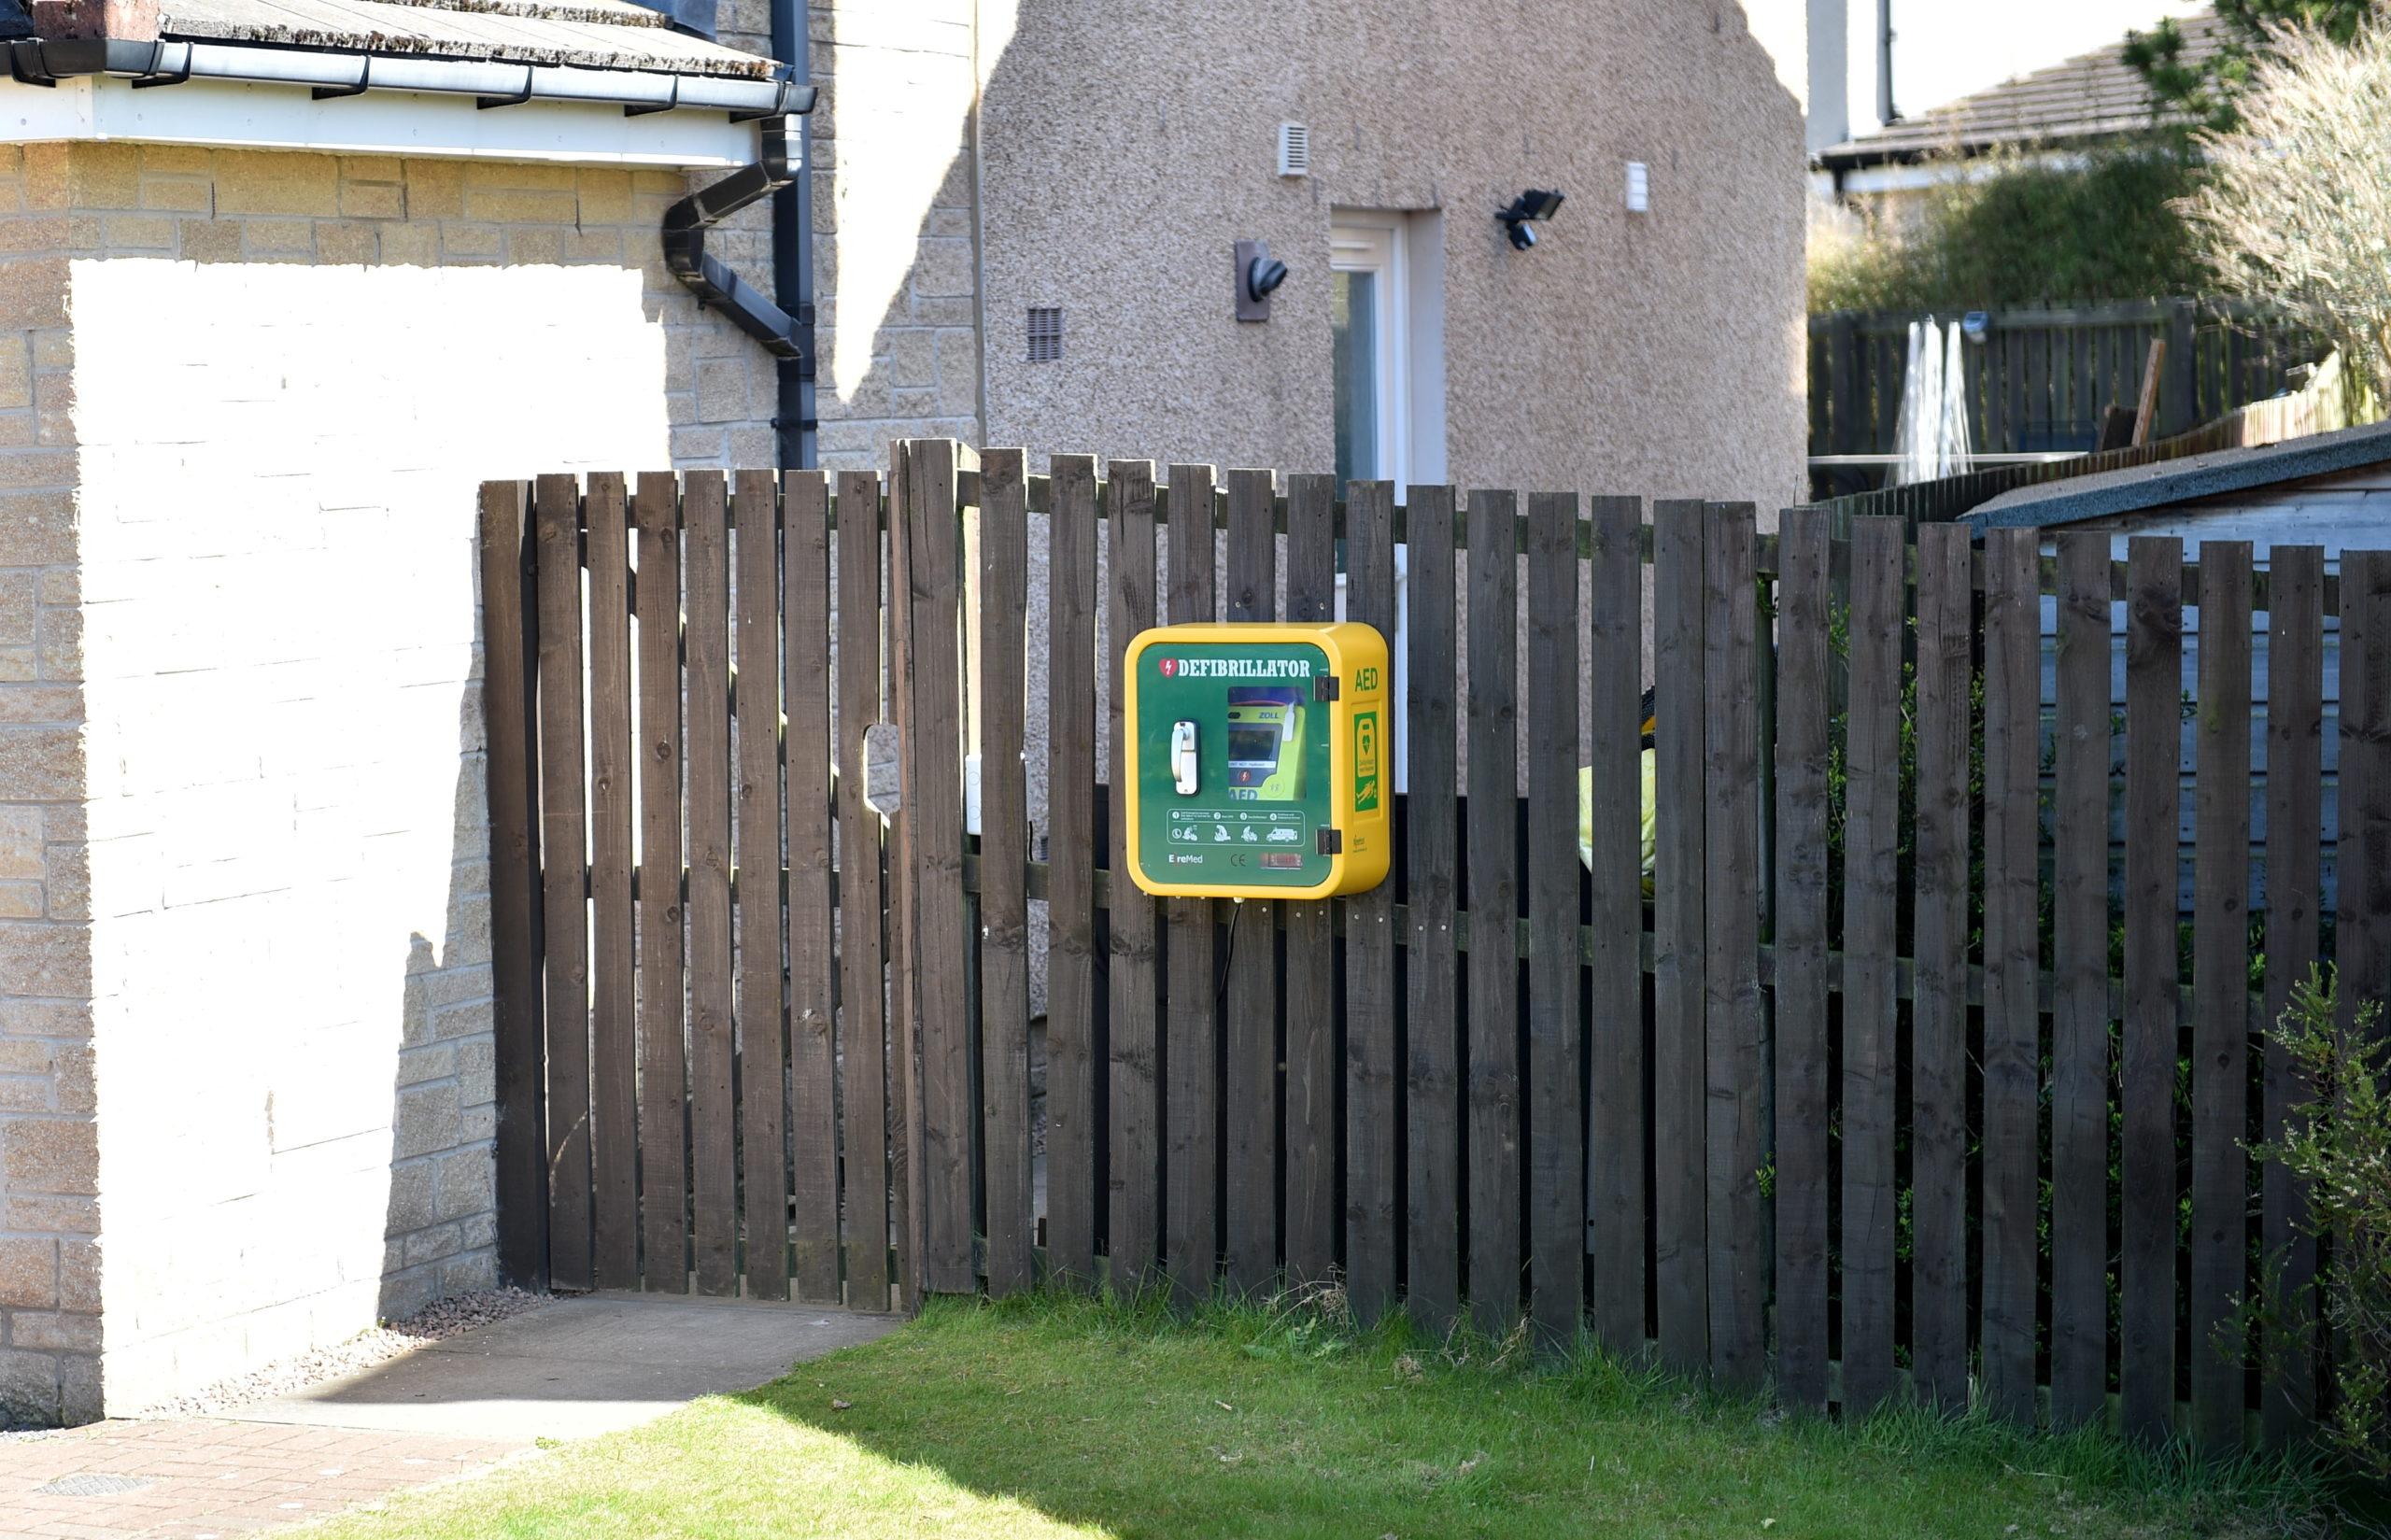 The new defibrillator in Kintore